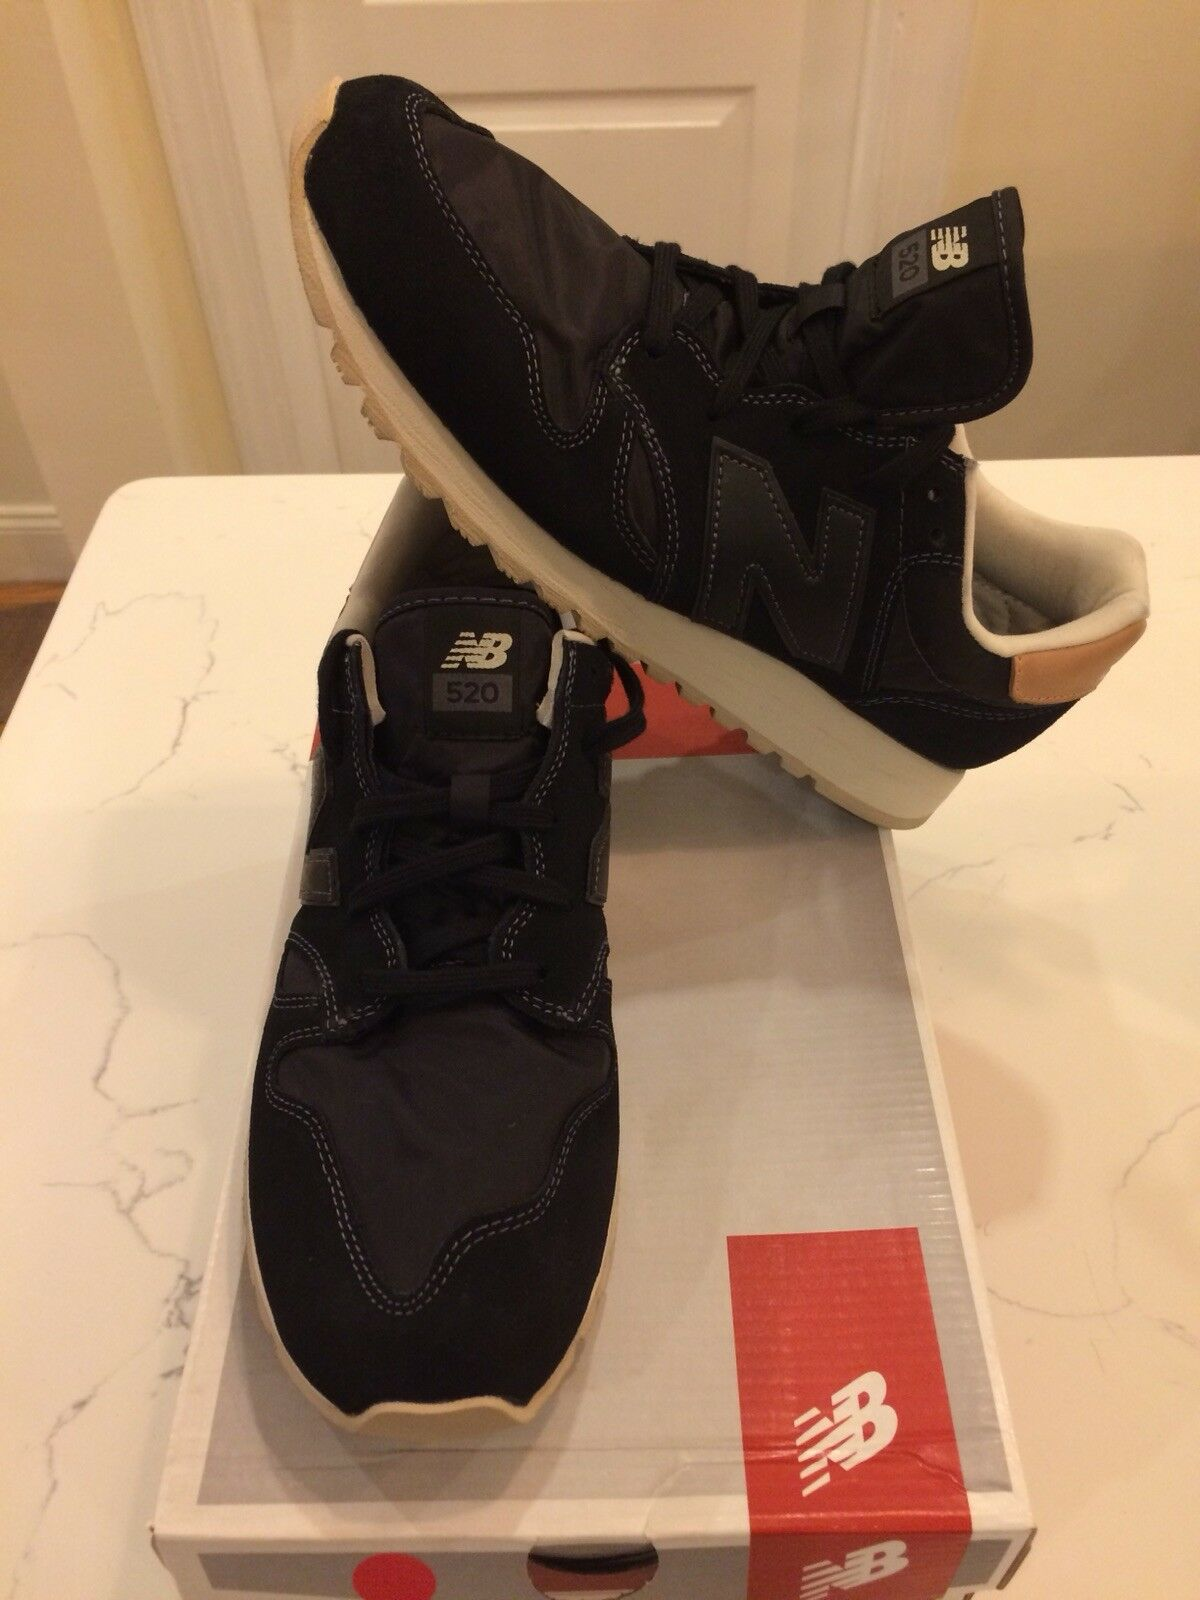 NEU Balance Damenschuhe Running Classics Schuhes Sneakers BLACK WL520BK Damenschuhe 10.5